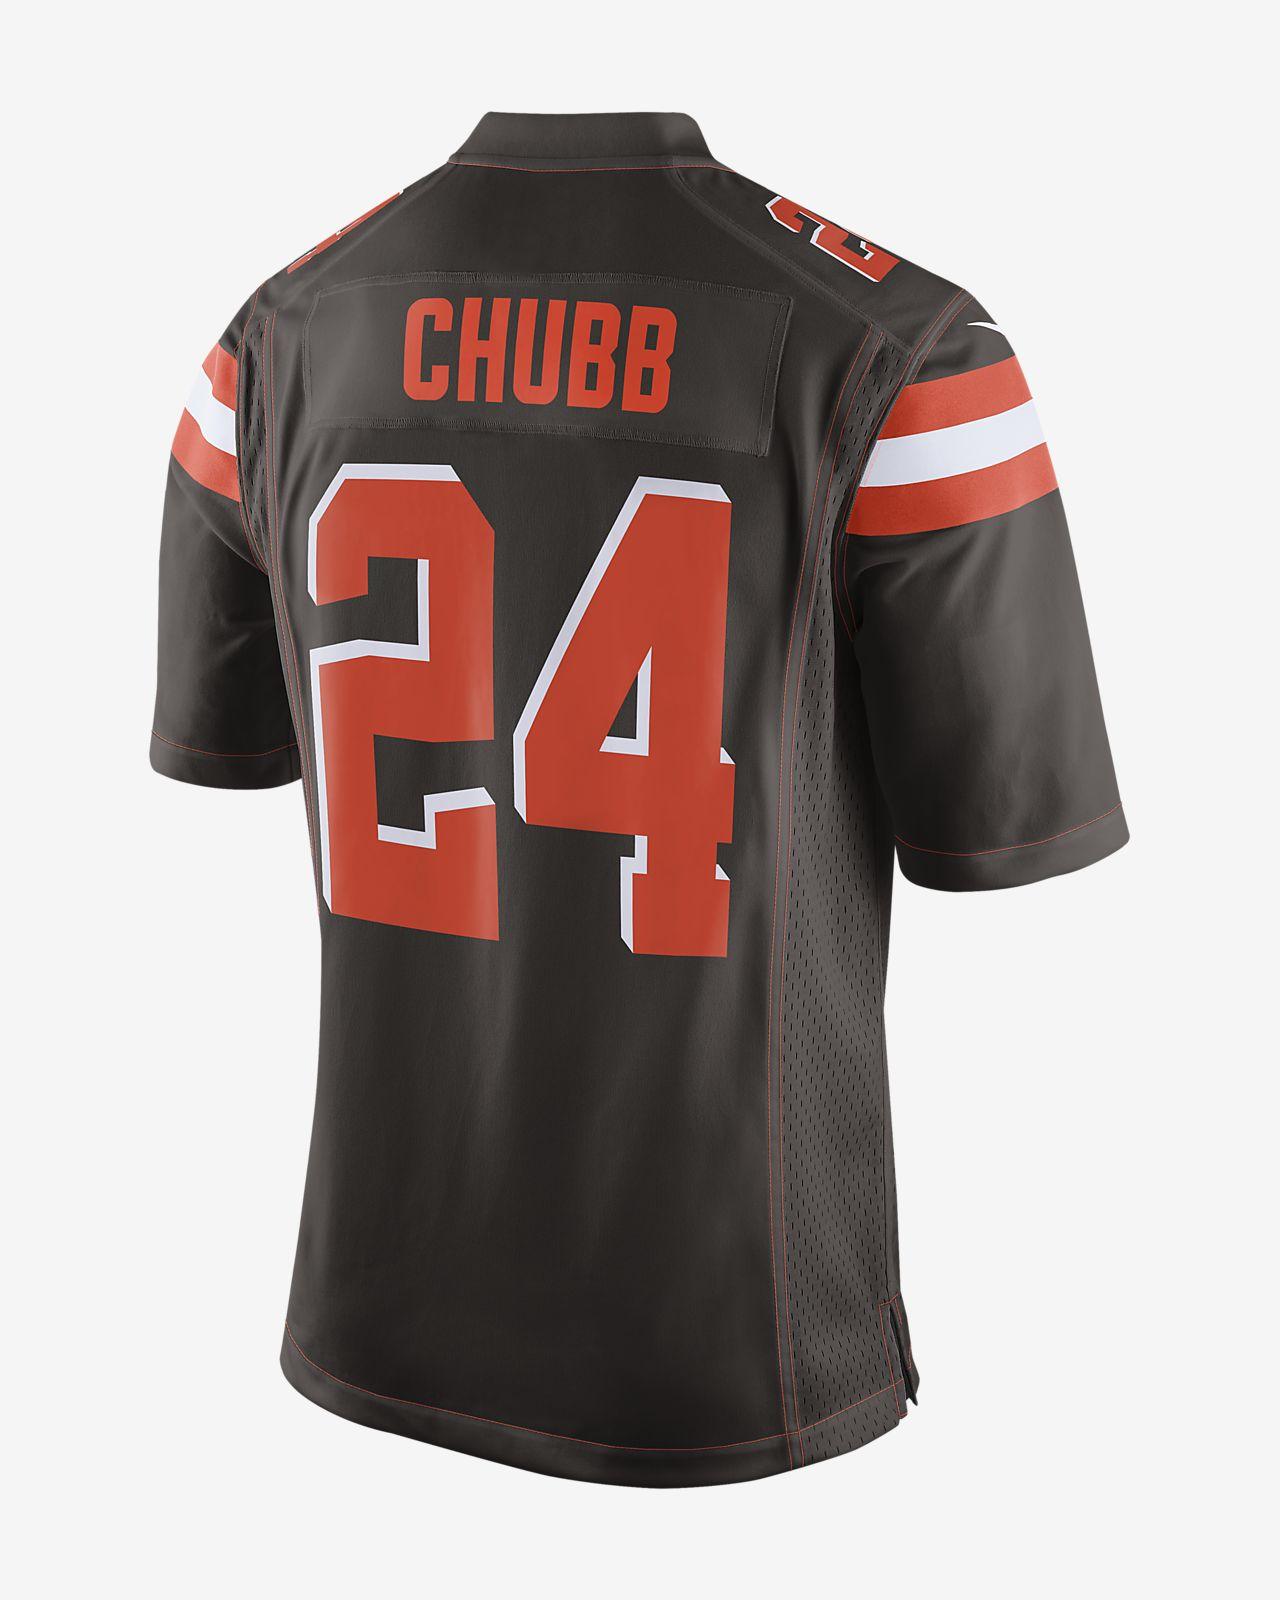 185b3bc191a NFL Cleveland Browns (Nick Chubb) Men s Game Football Jersey. Nike.com